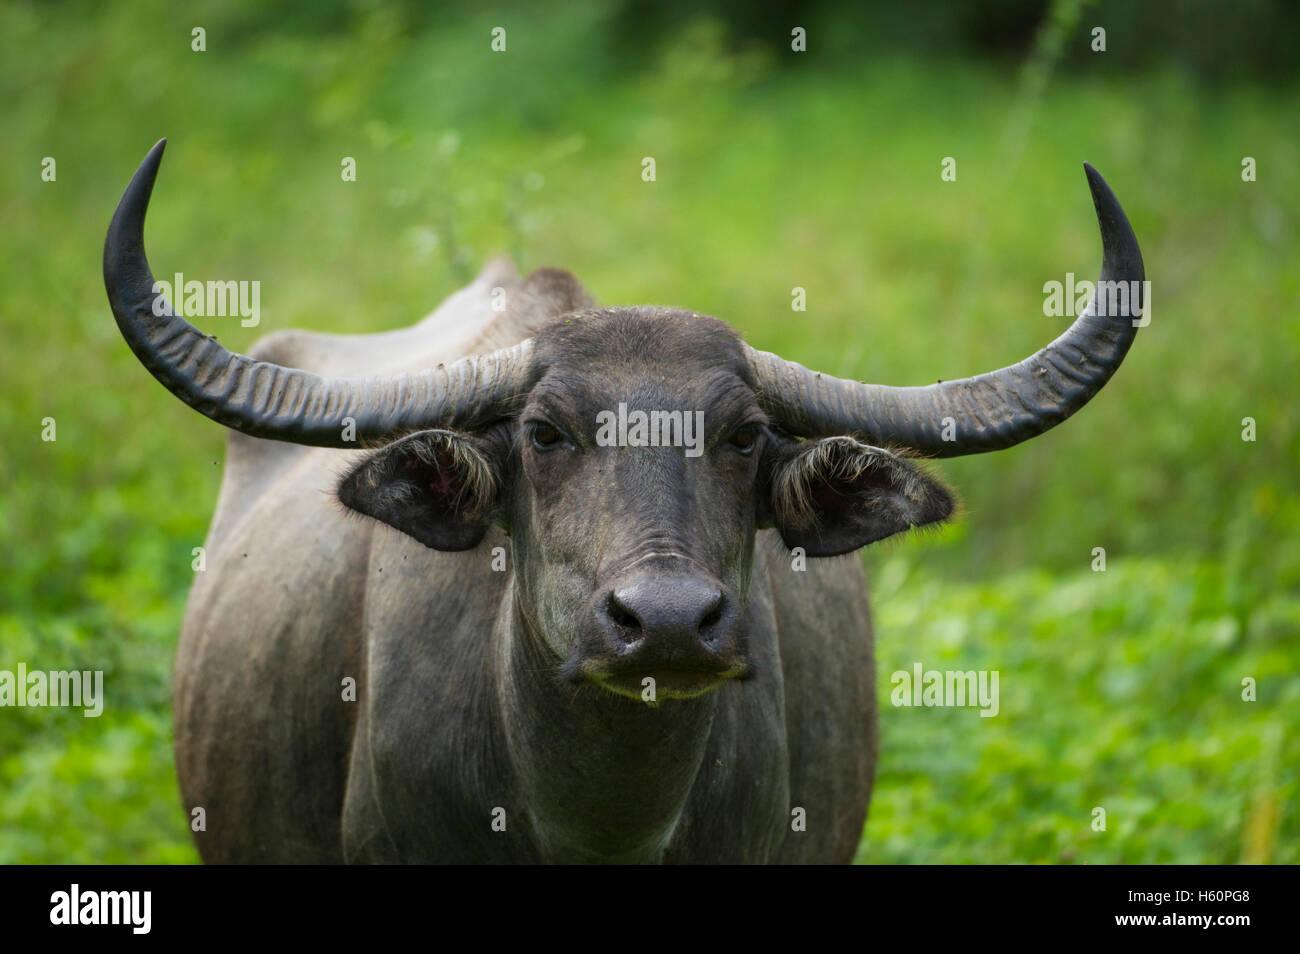 Wild Water buffalo, Bubalus bubalus, parc national de Yala, au Sri Lanka Photo Stock